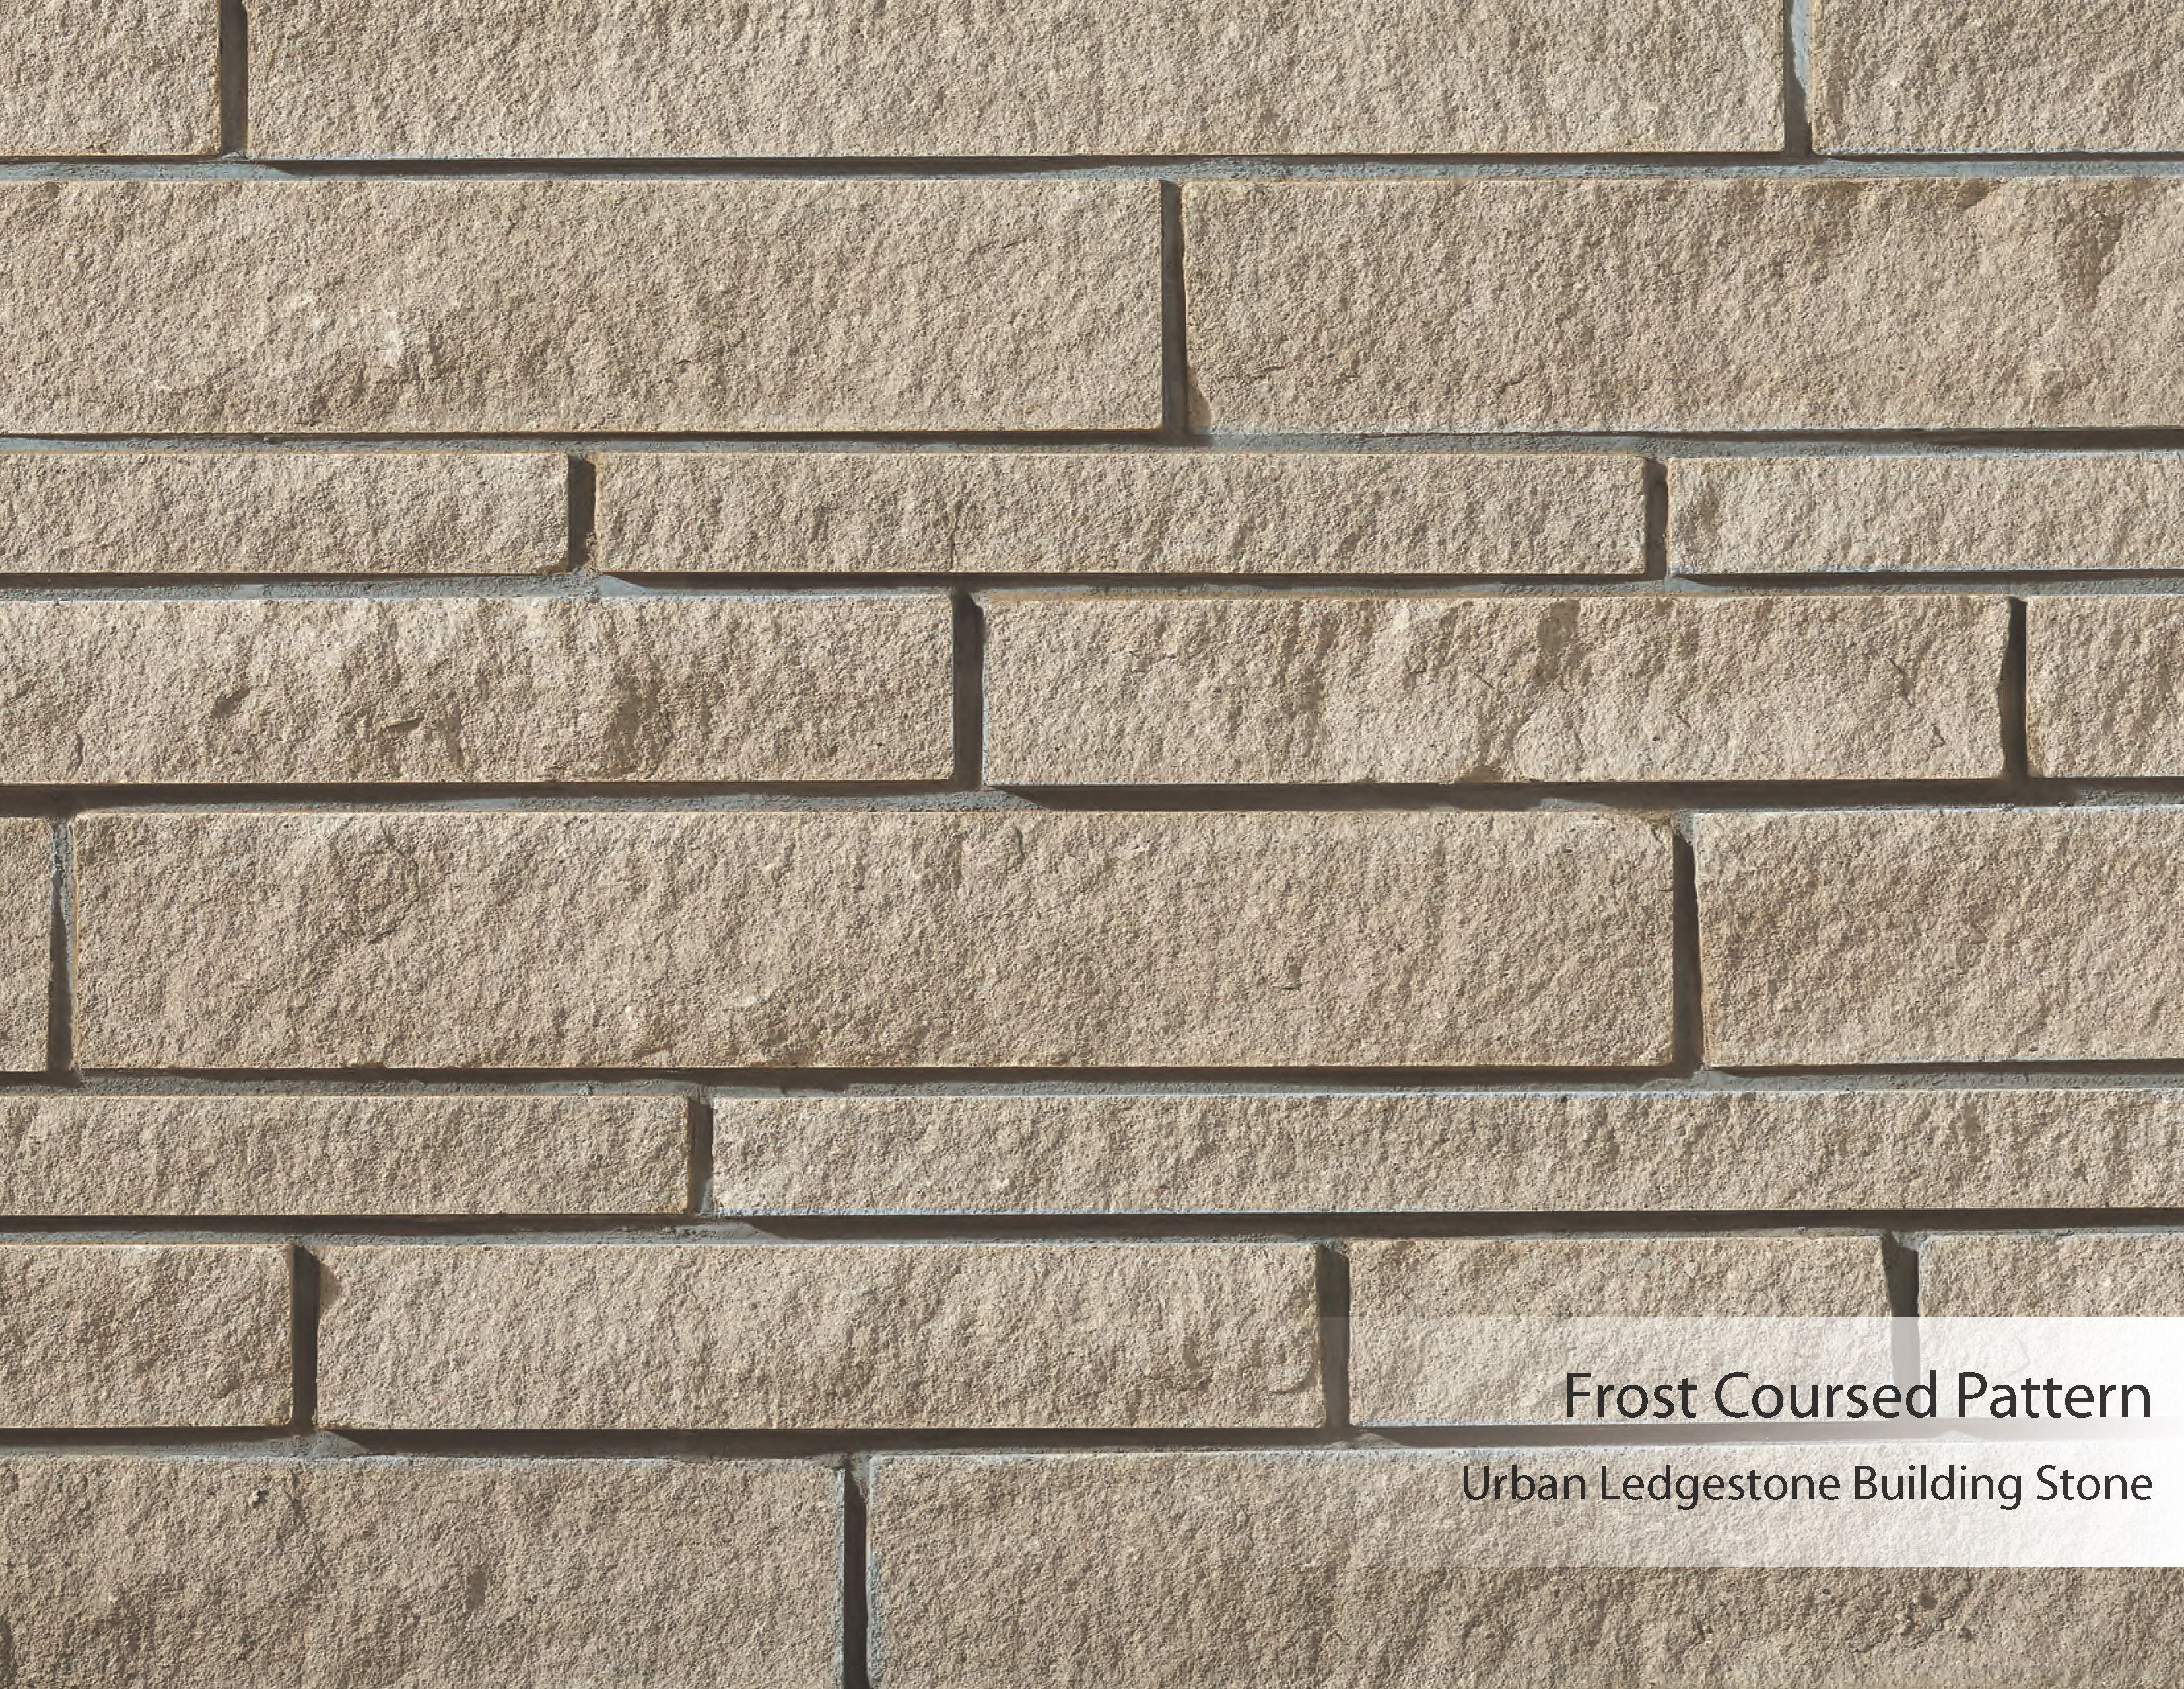 Urban Ledgestone Building Stone Frost Coursed Pattern Building Stone Ledgestone Concrete Floors